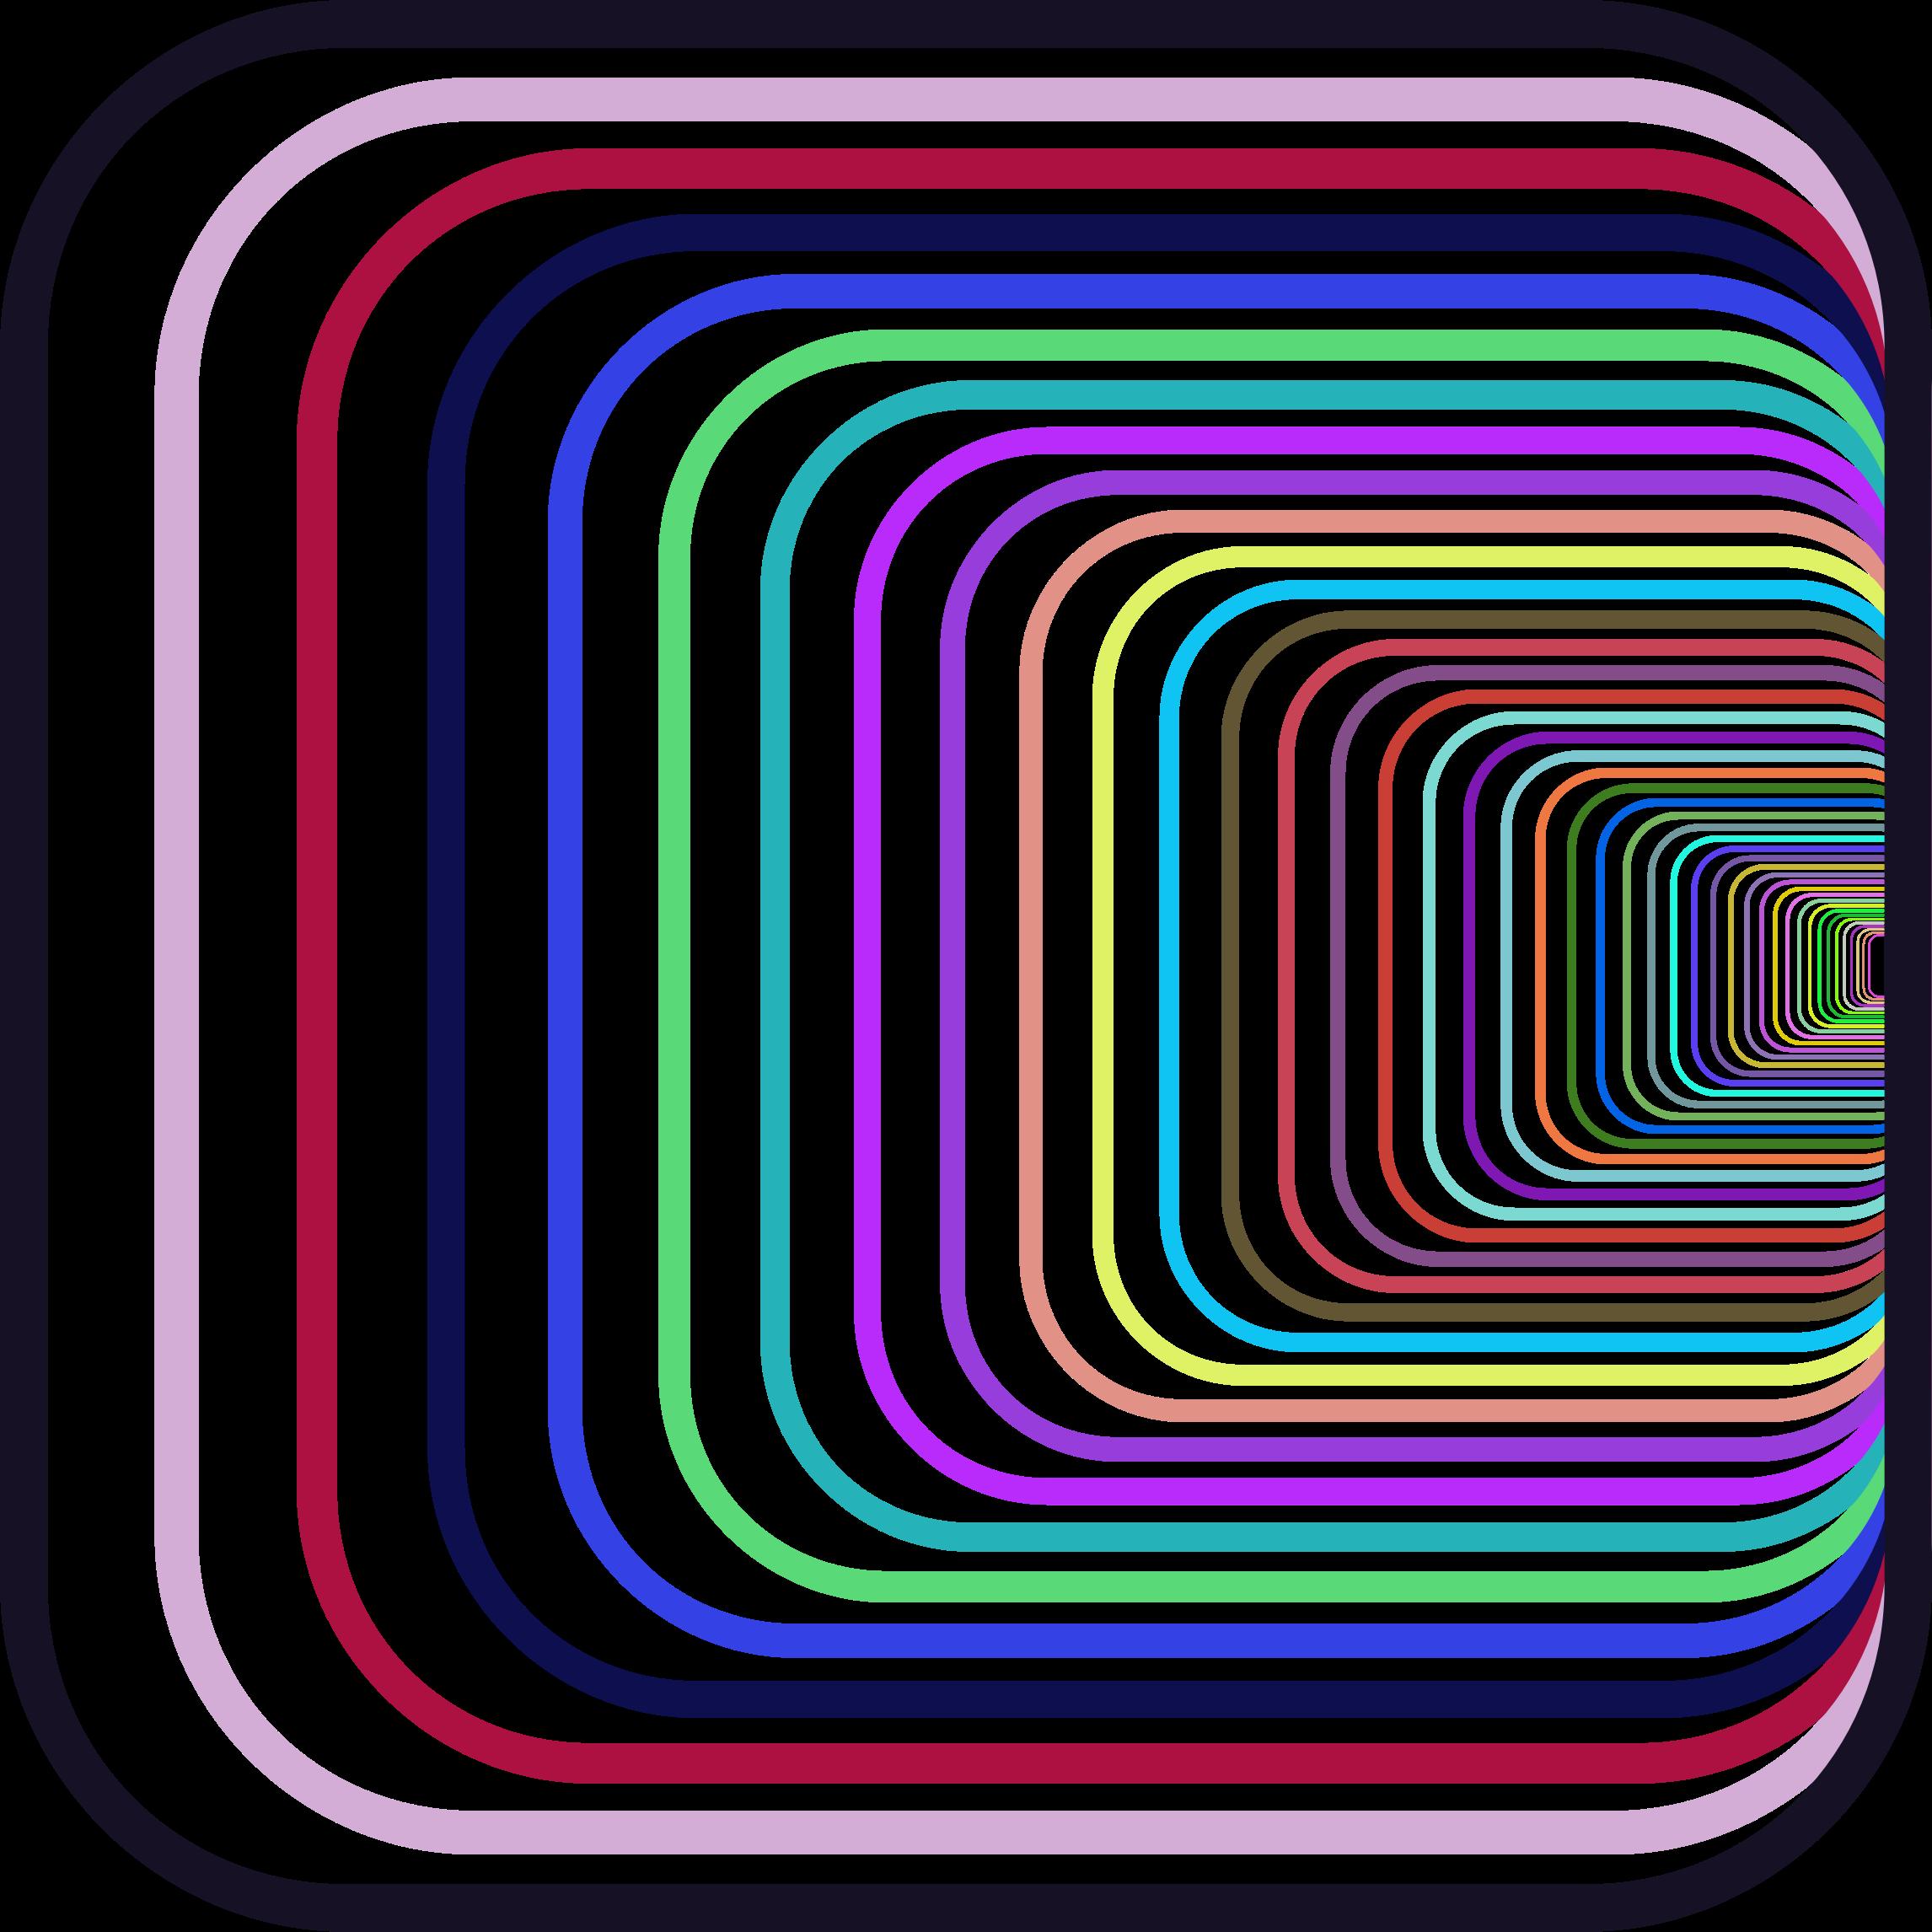 Illusion clipart line Prismatic Perspective Clipart Illusion Perspective